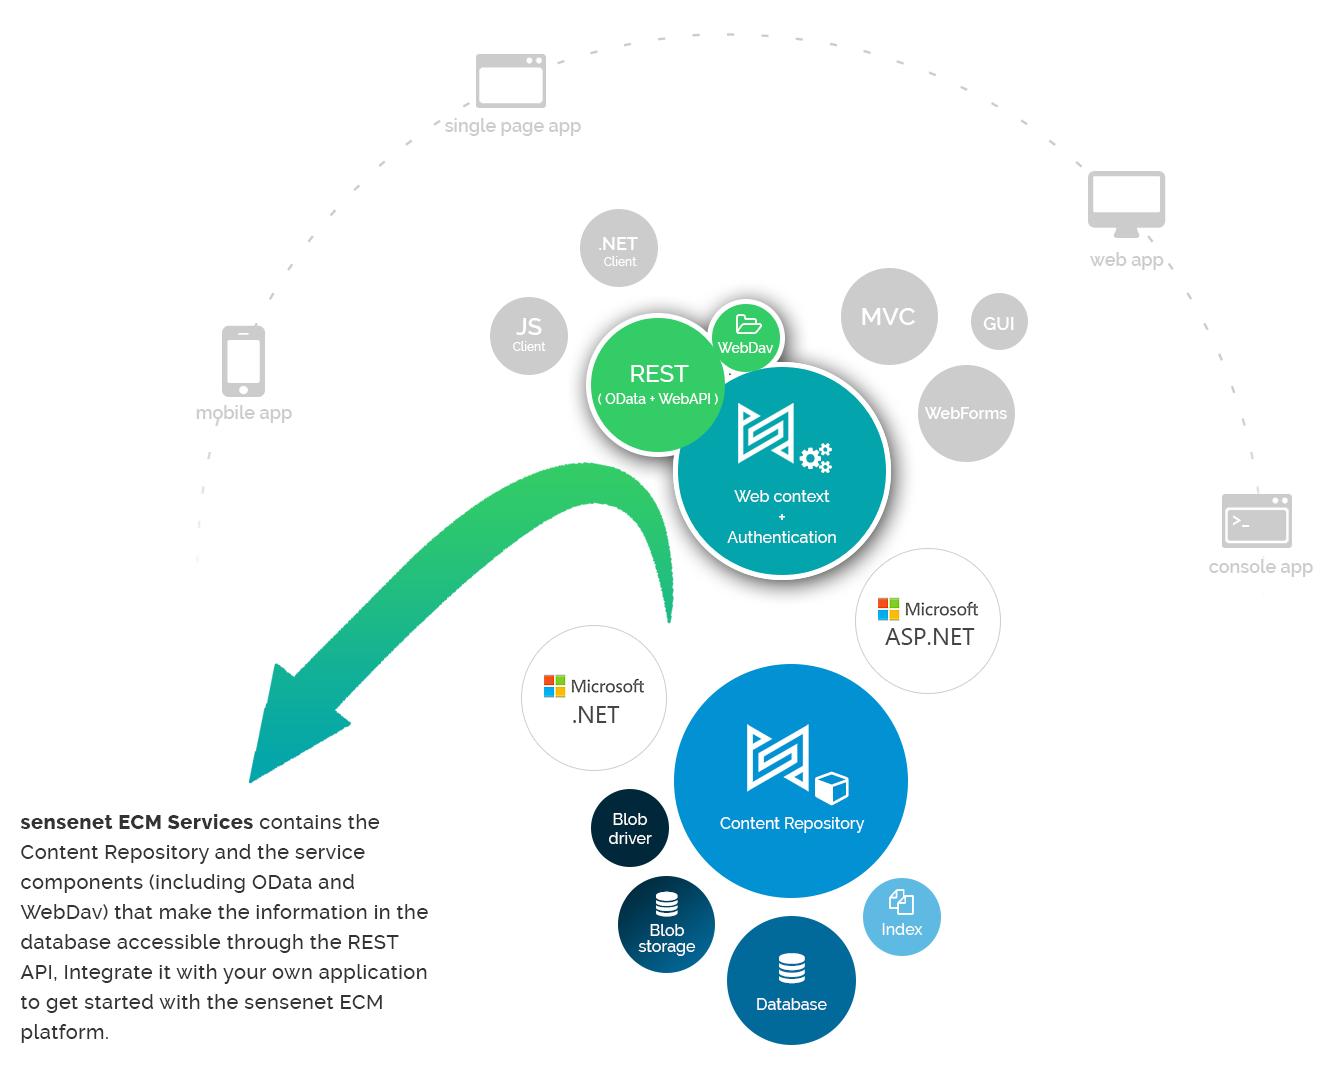 sensenet Services